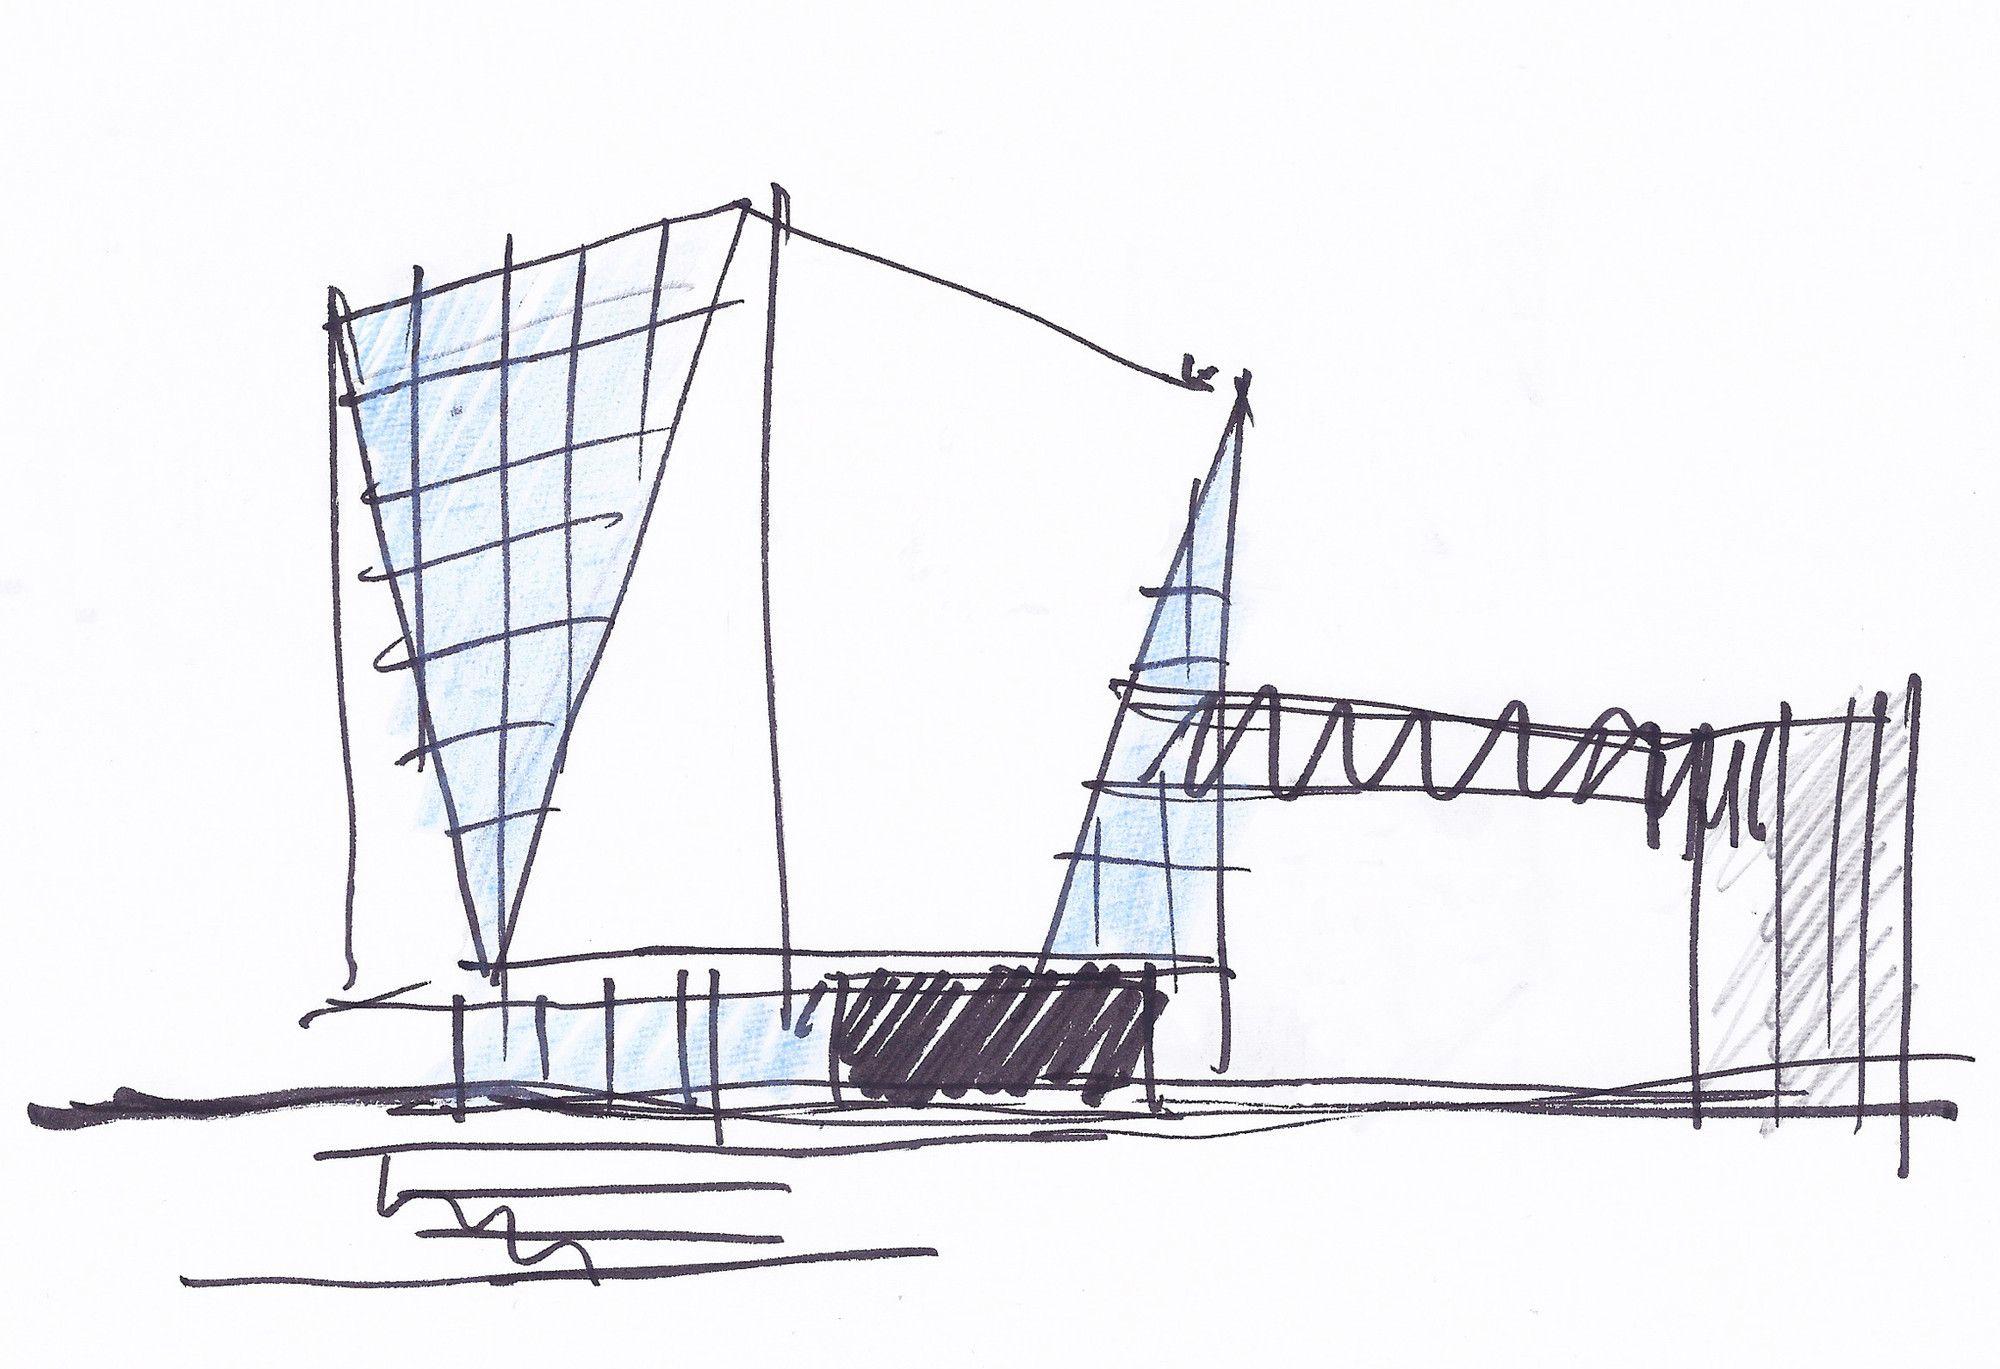 simple architectural drawings. Exellent Simple Simple Architectural Drawings Gallery Of Vila Franca De Xira Municipal  Library  Miguel Arruda Arquitectos In Simple Architectural Drawings